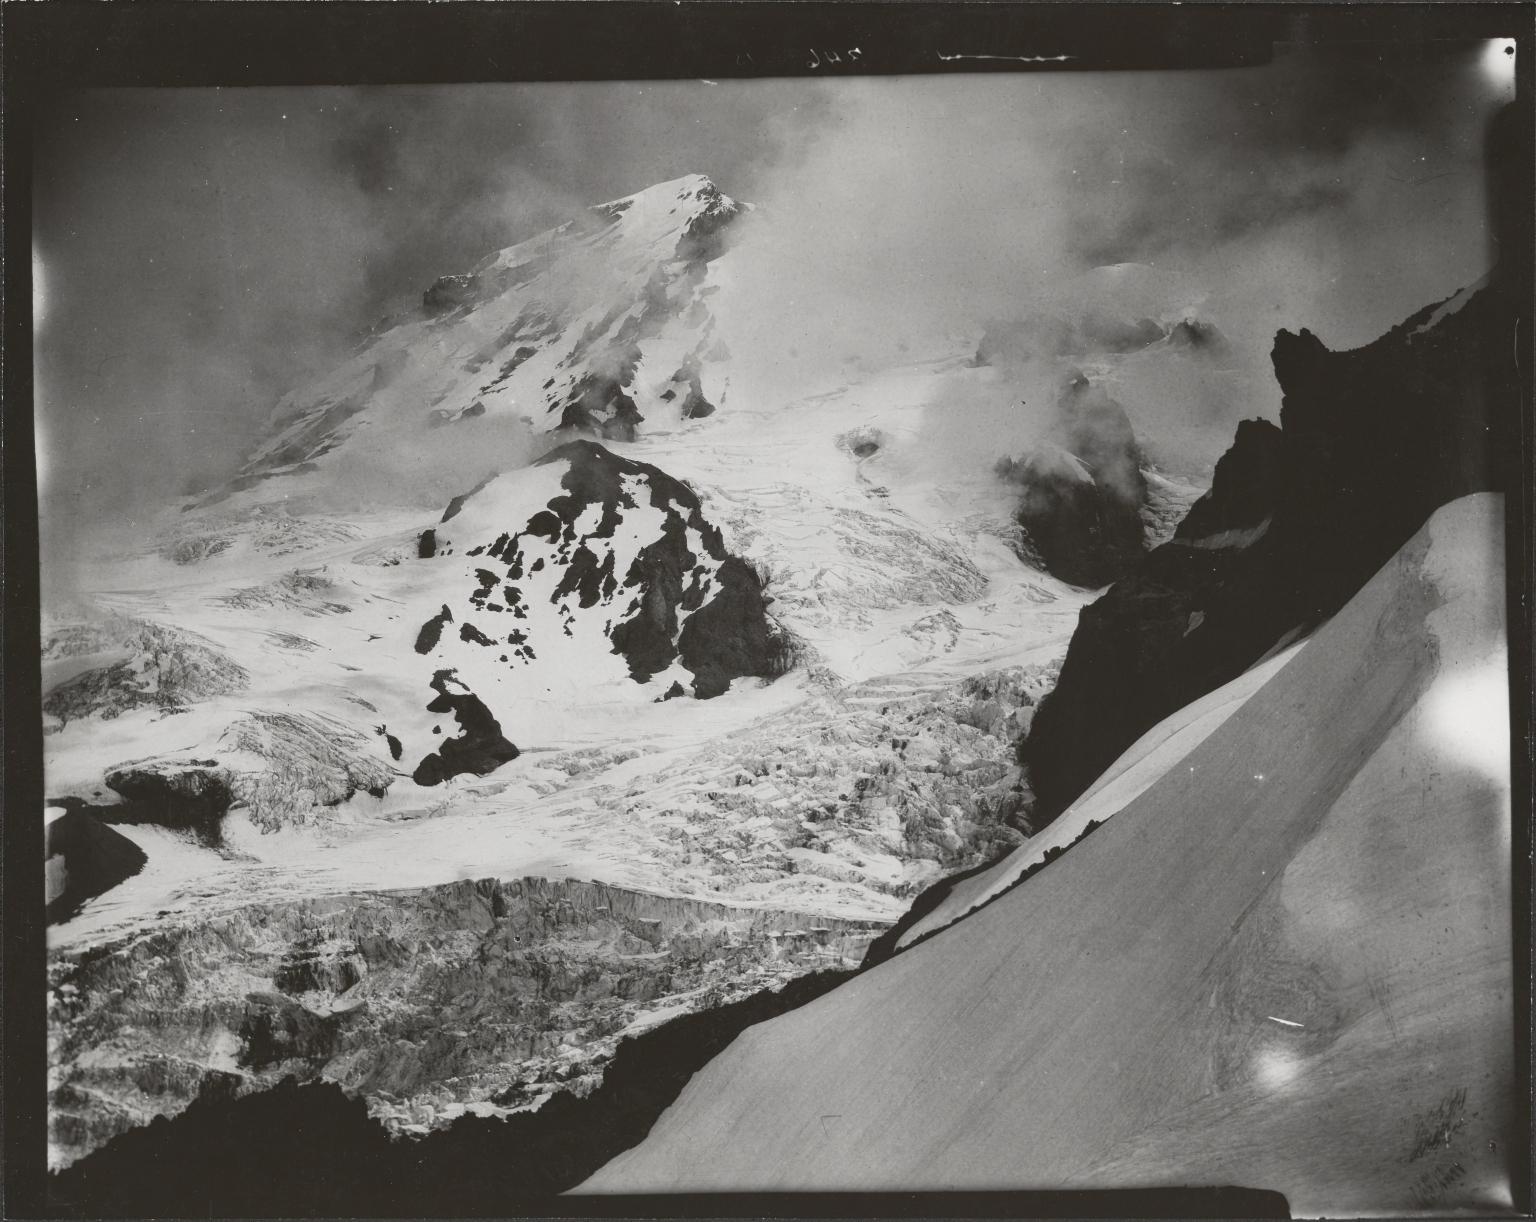 South Mowich Glacier, Washington